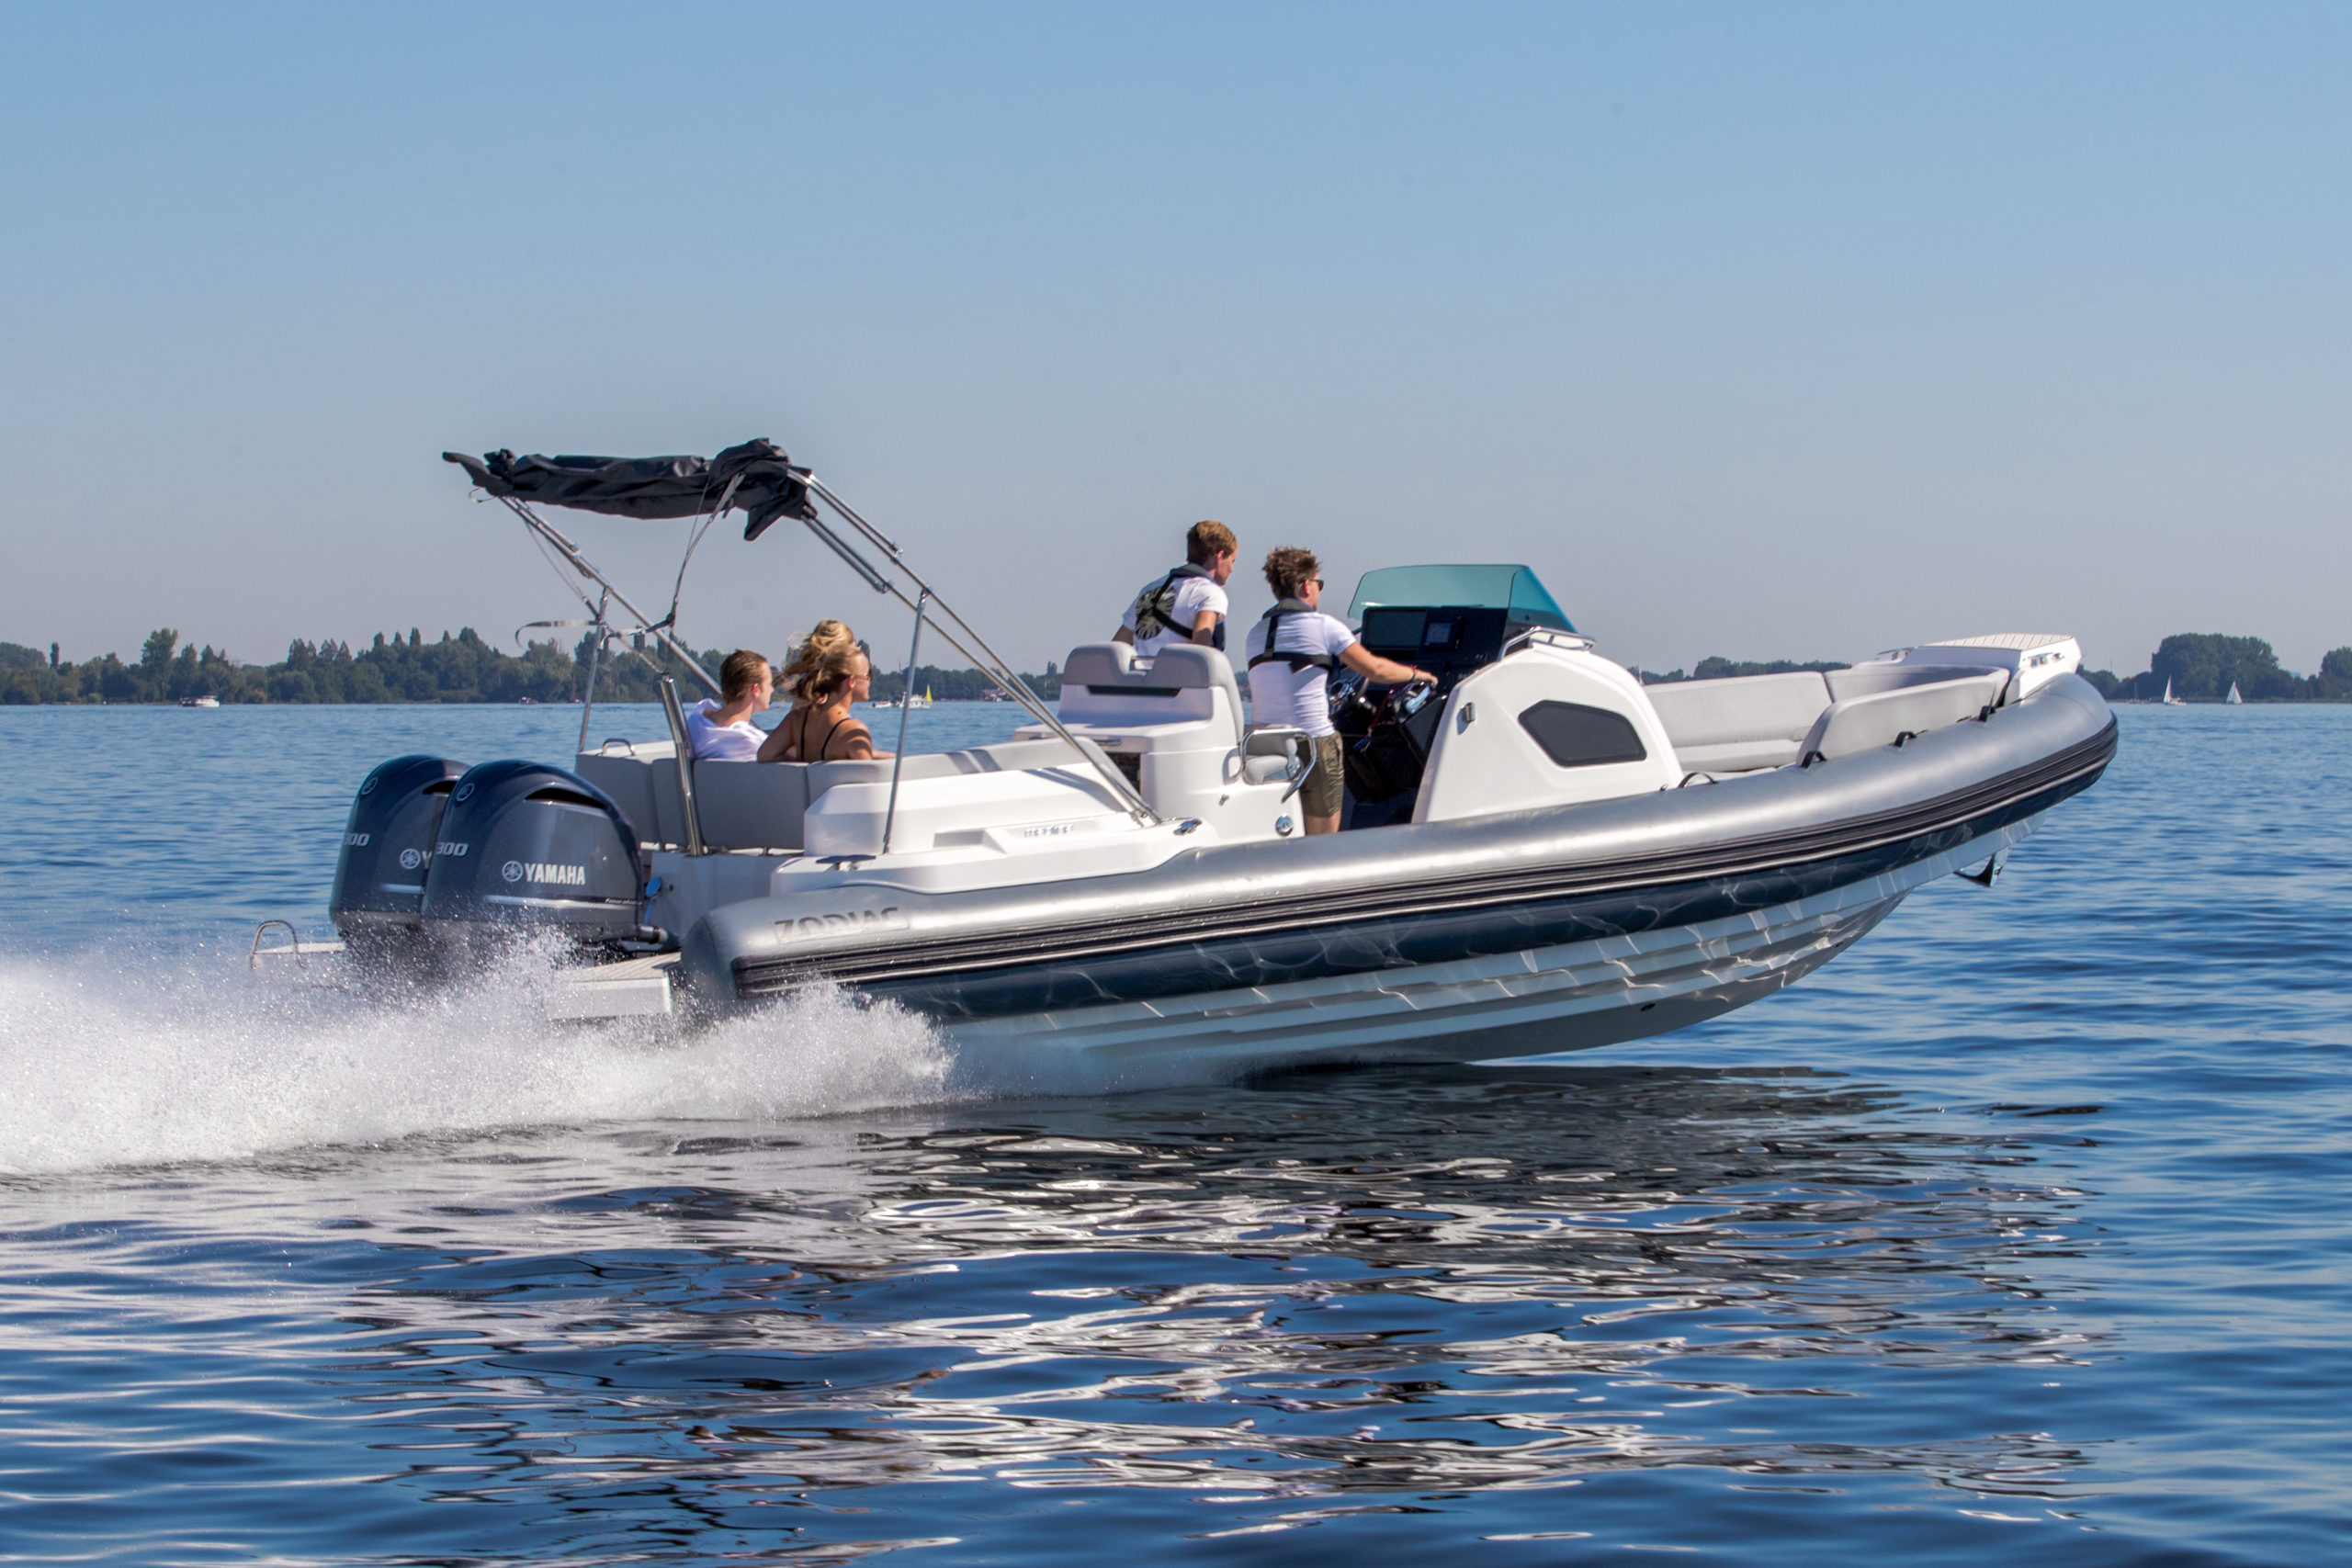 zodiac-zodiac-medline-9-rib-yamaha-300pk-rubberboot-aalsmeer-36